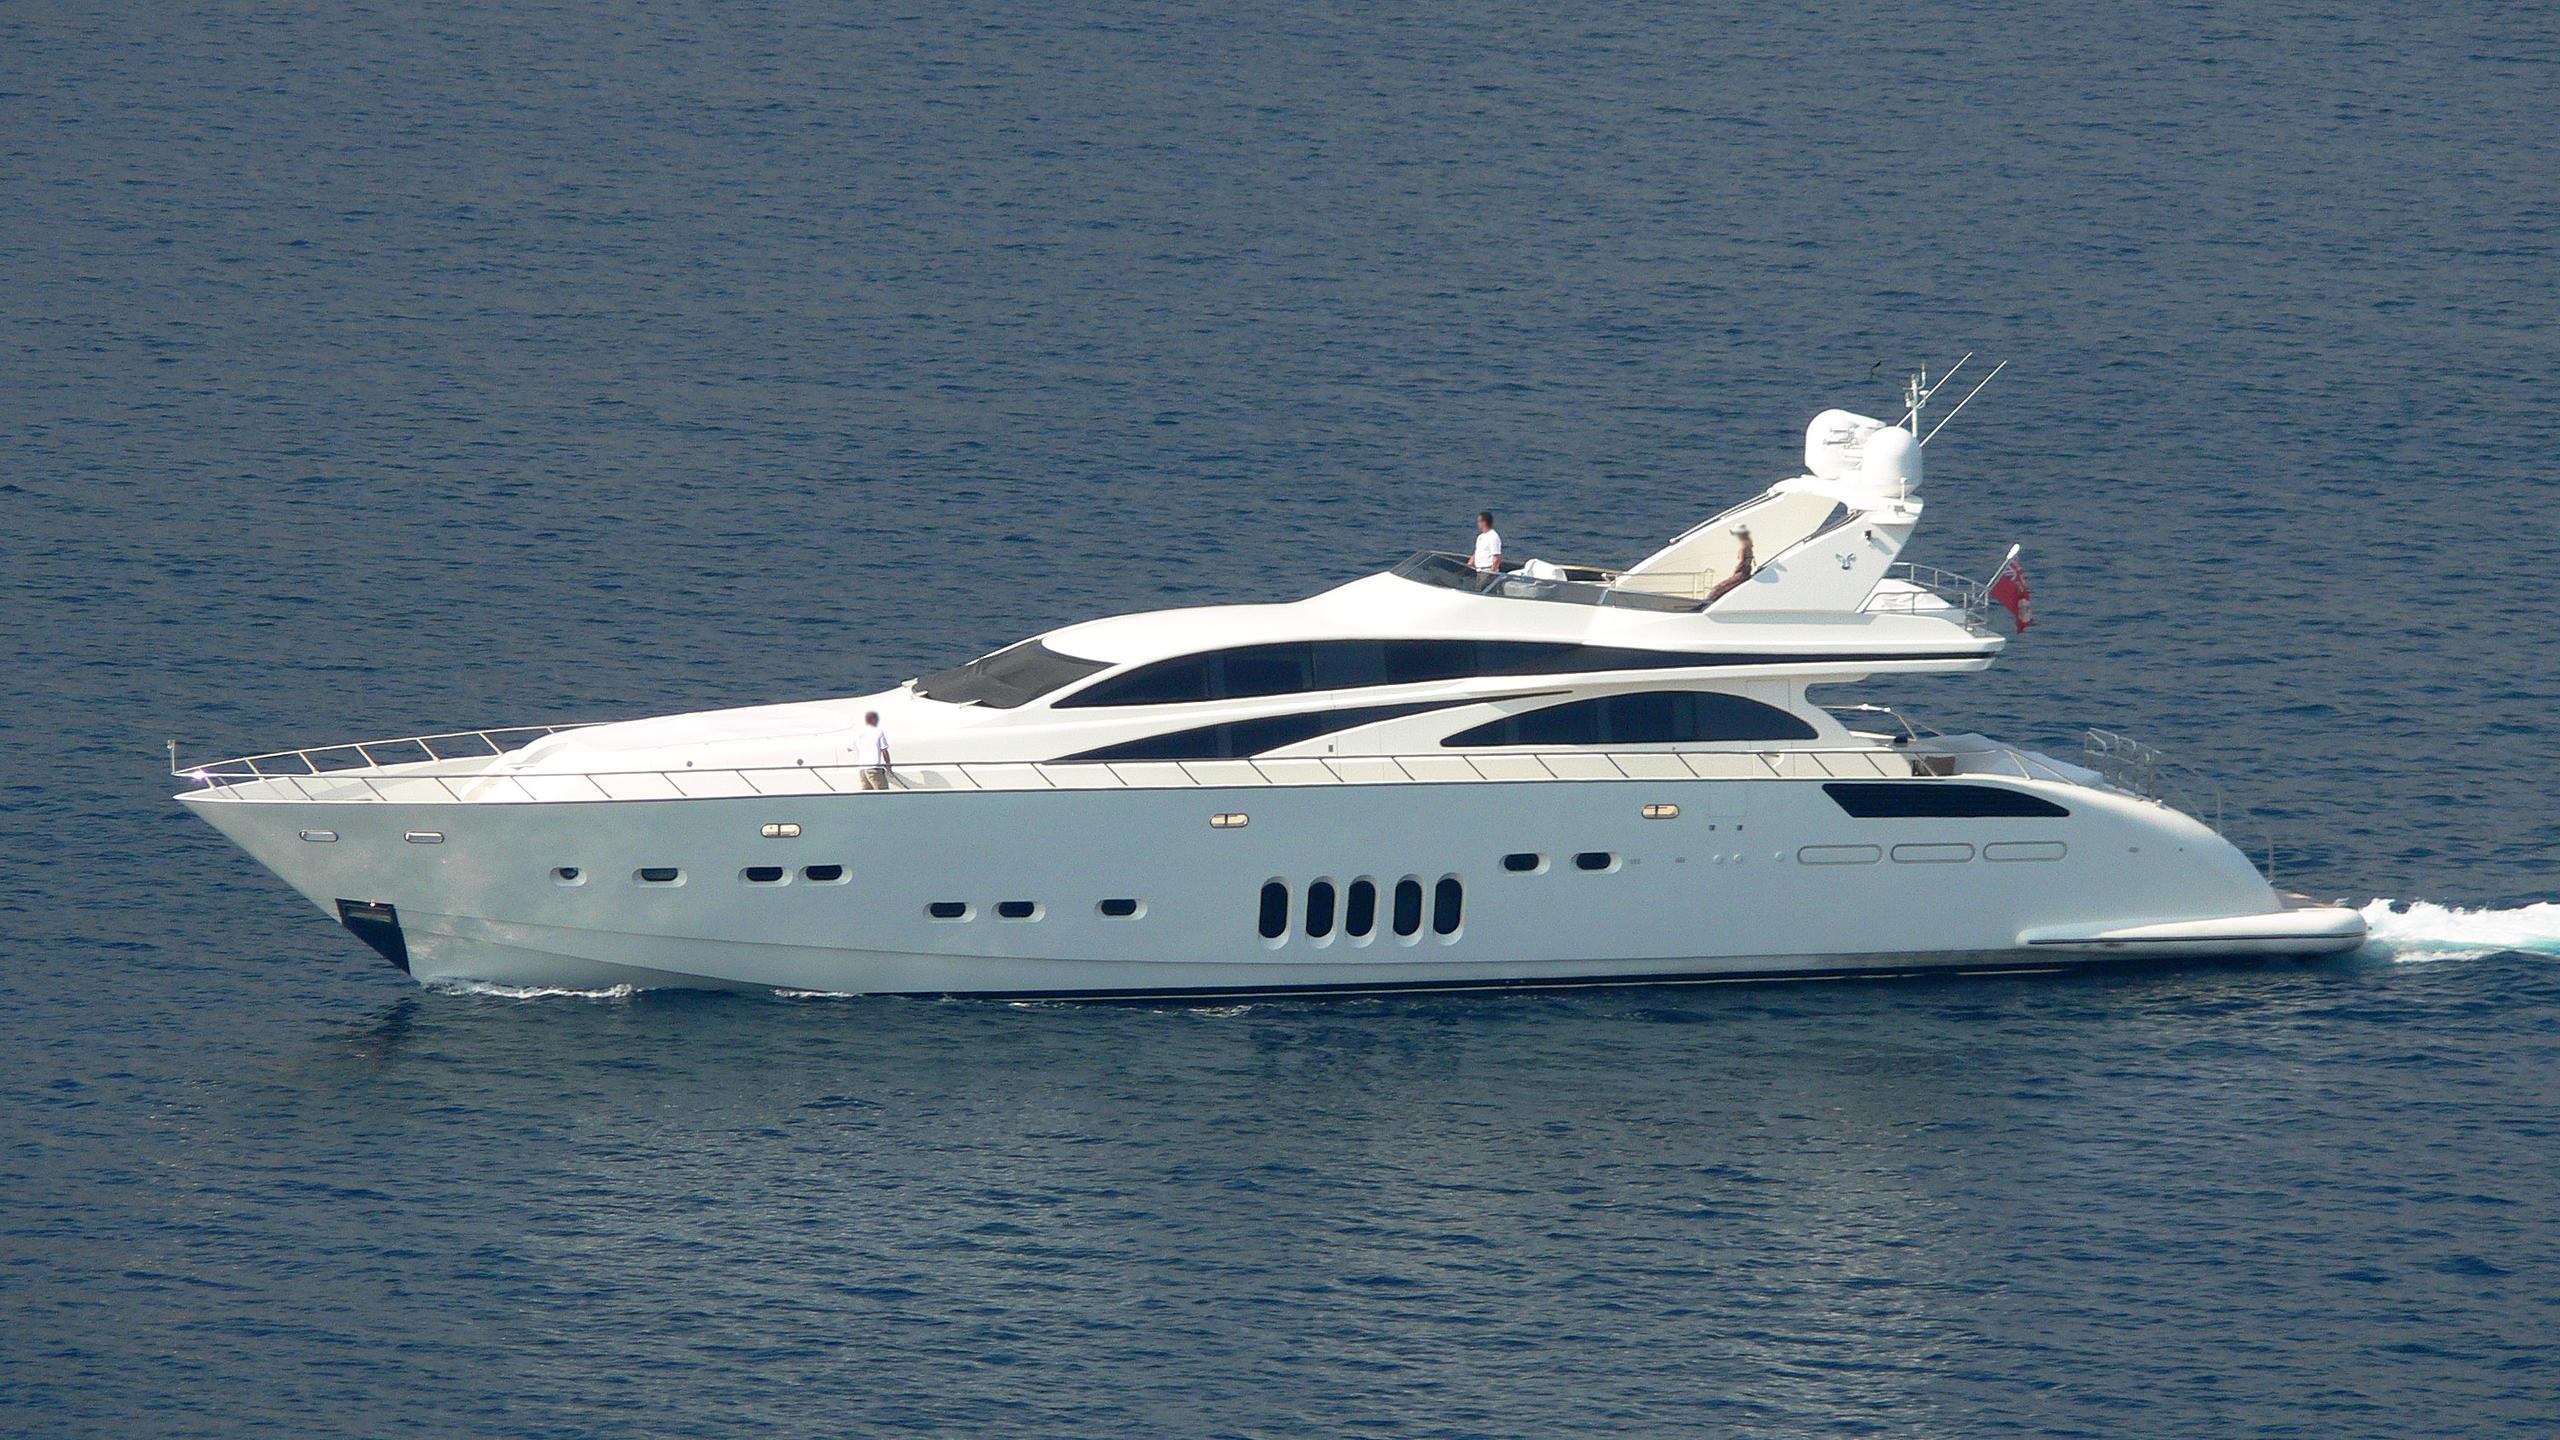 jade-mary-motor-yacht-arno-leopard-32-sport-2005-32m-profile